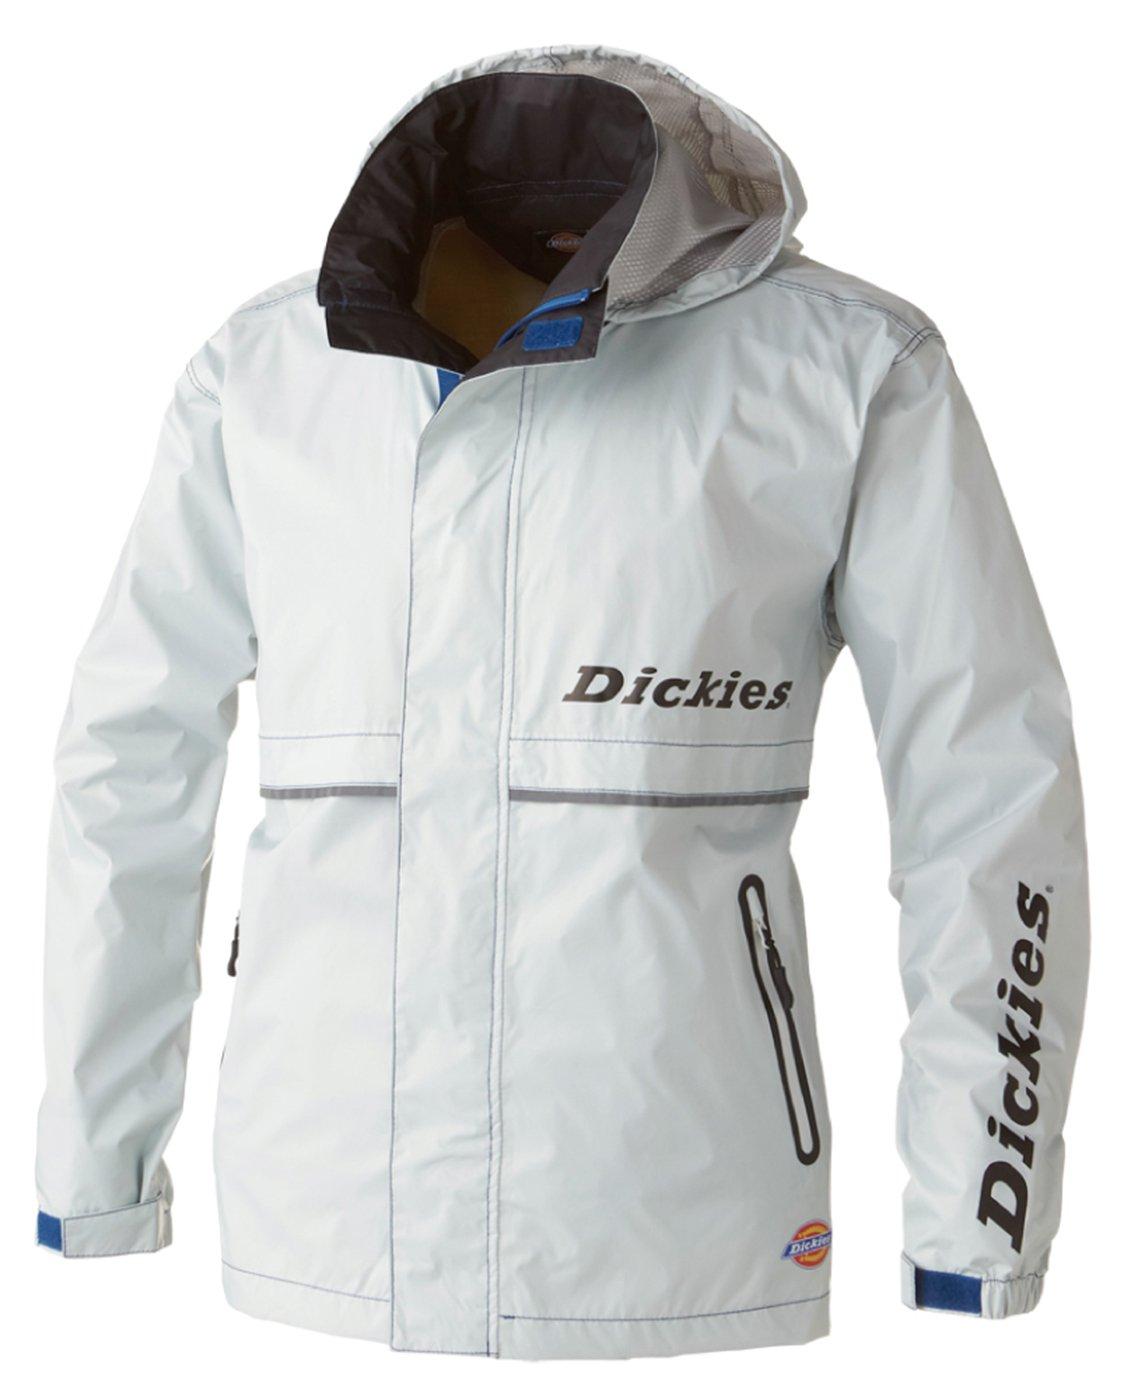 Dickies(ディッキーズ) Dickies レインウェア 上着 合羽 メンズ cc-d3505 B078TVN57P L|シルバー シルバー L